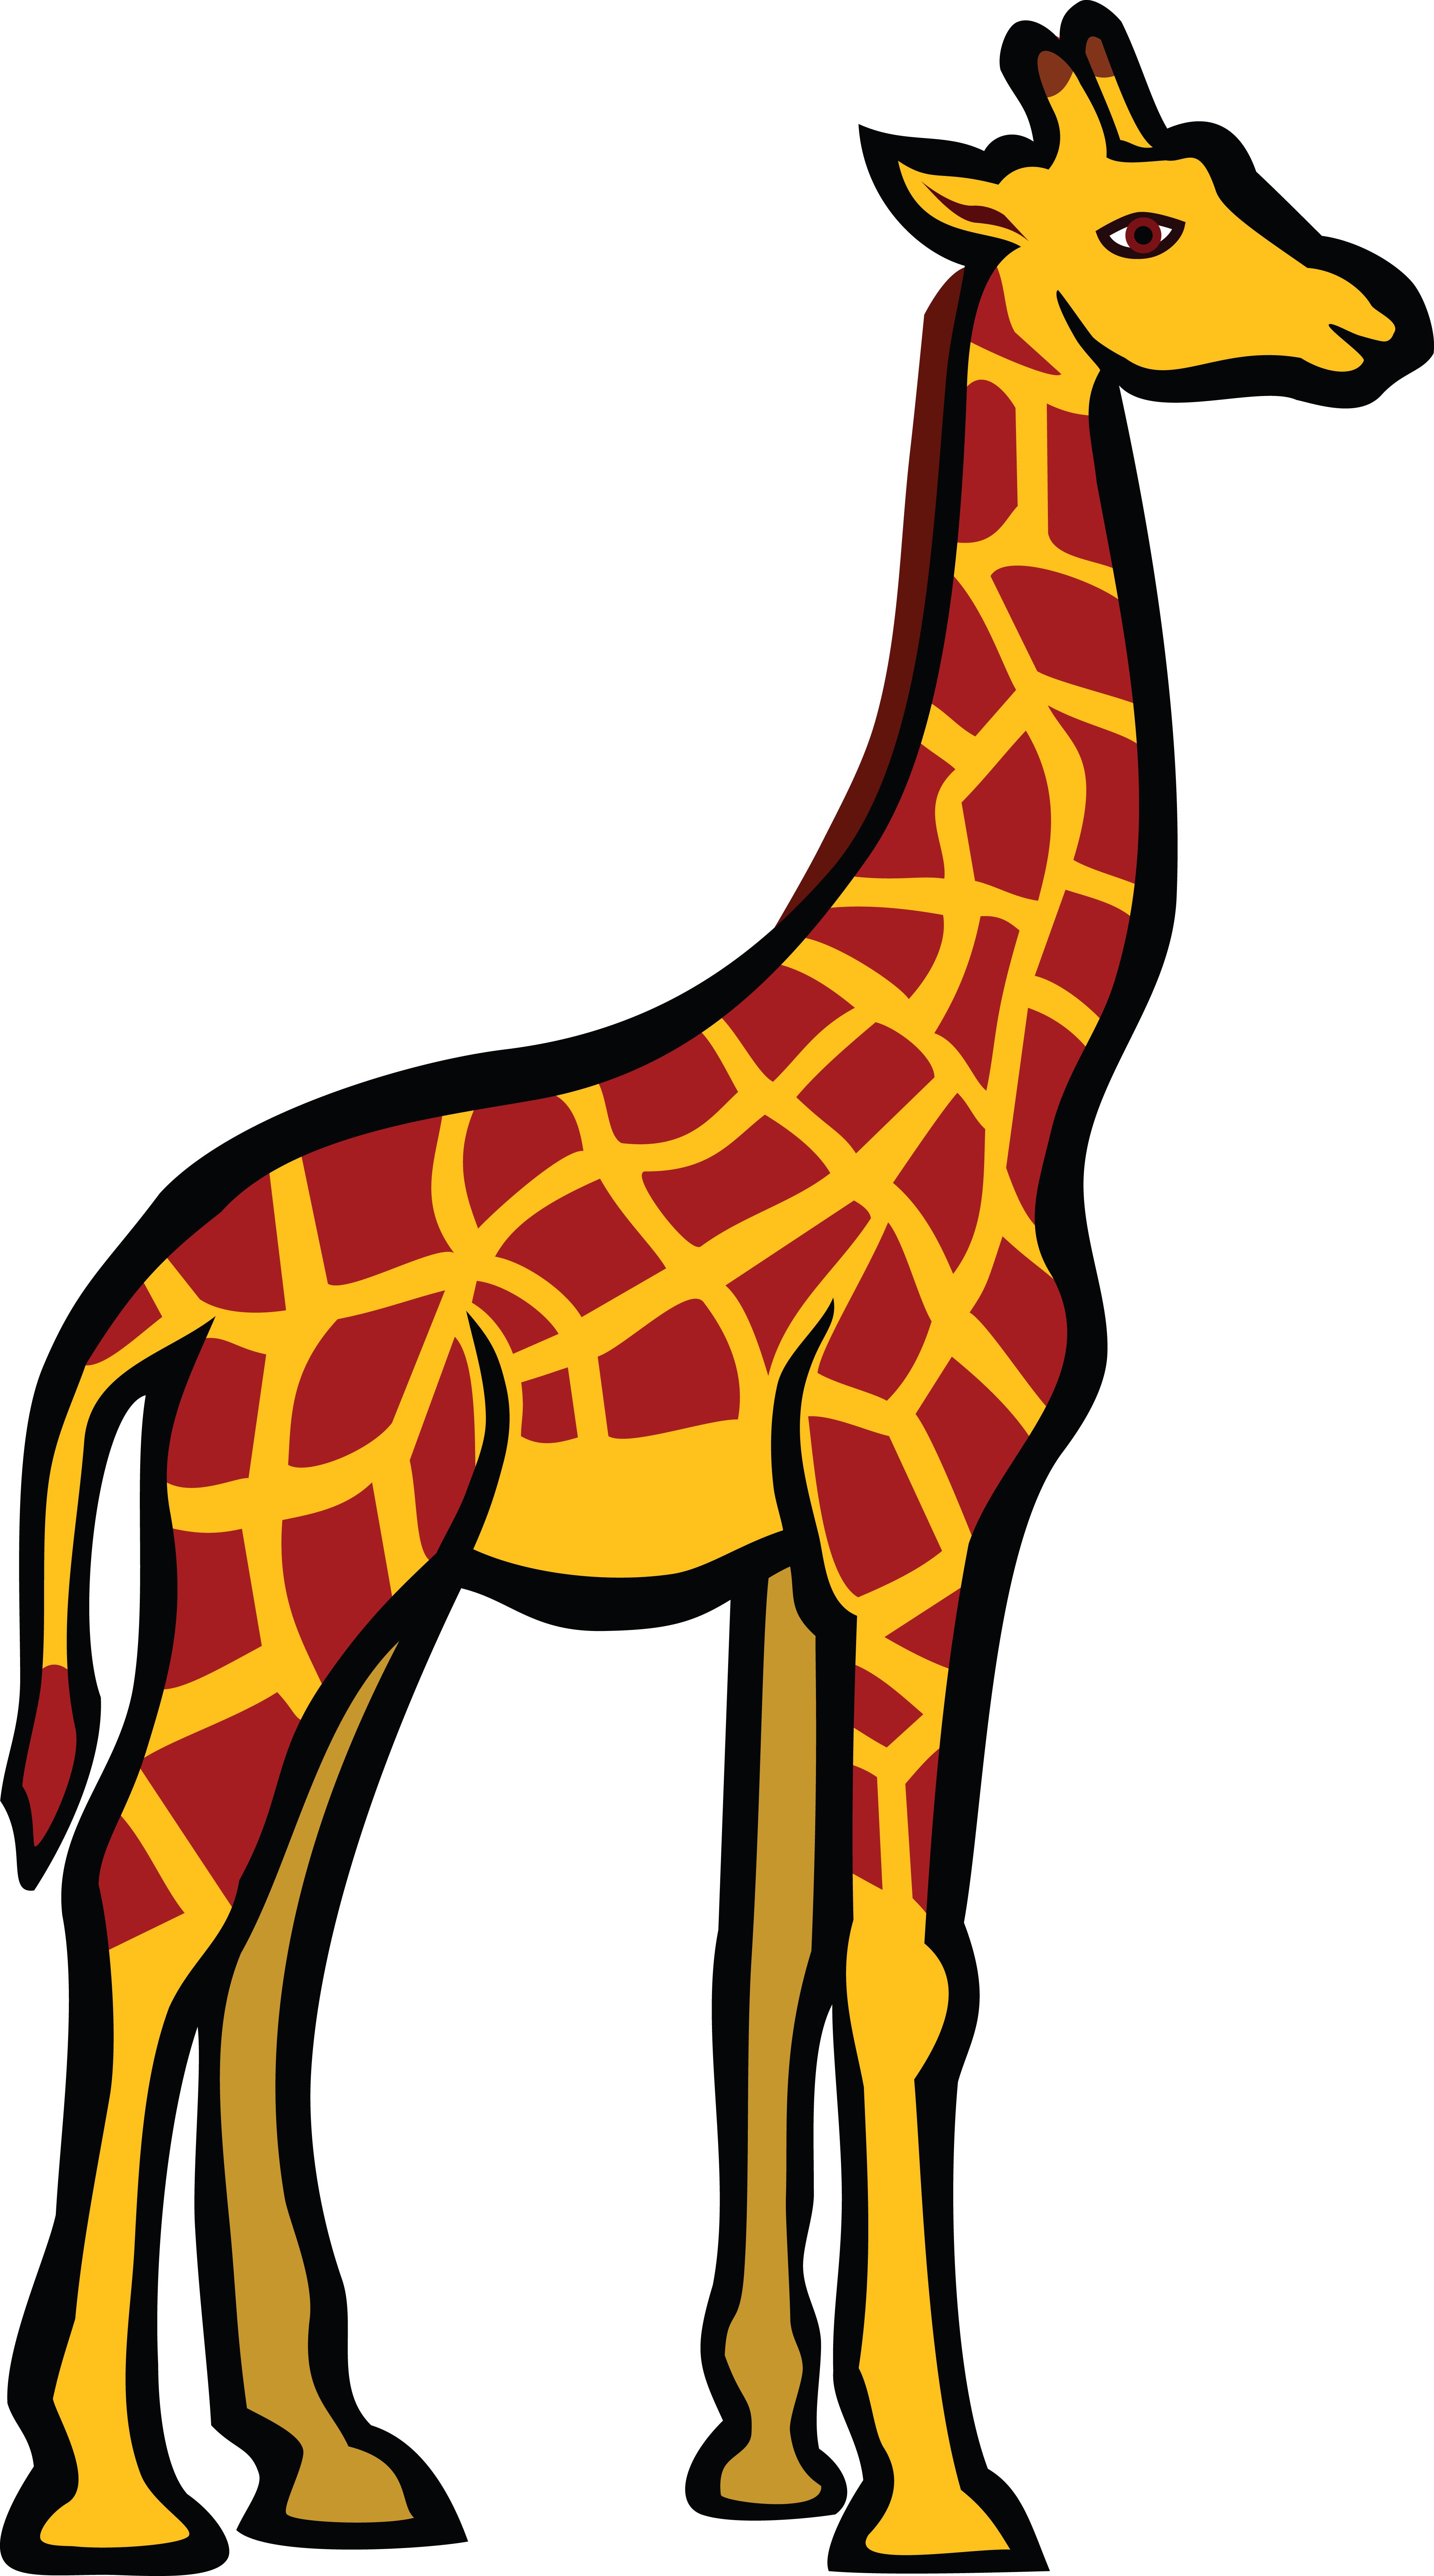 4000x7188 Free Clipart Of A Giraffe